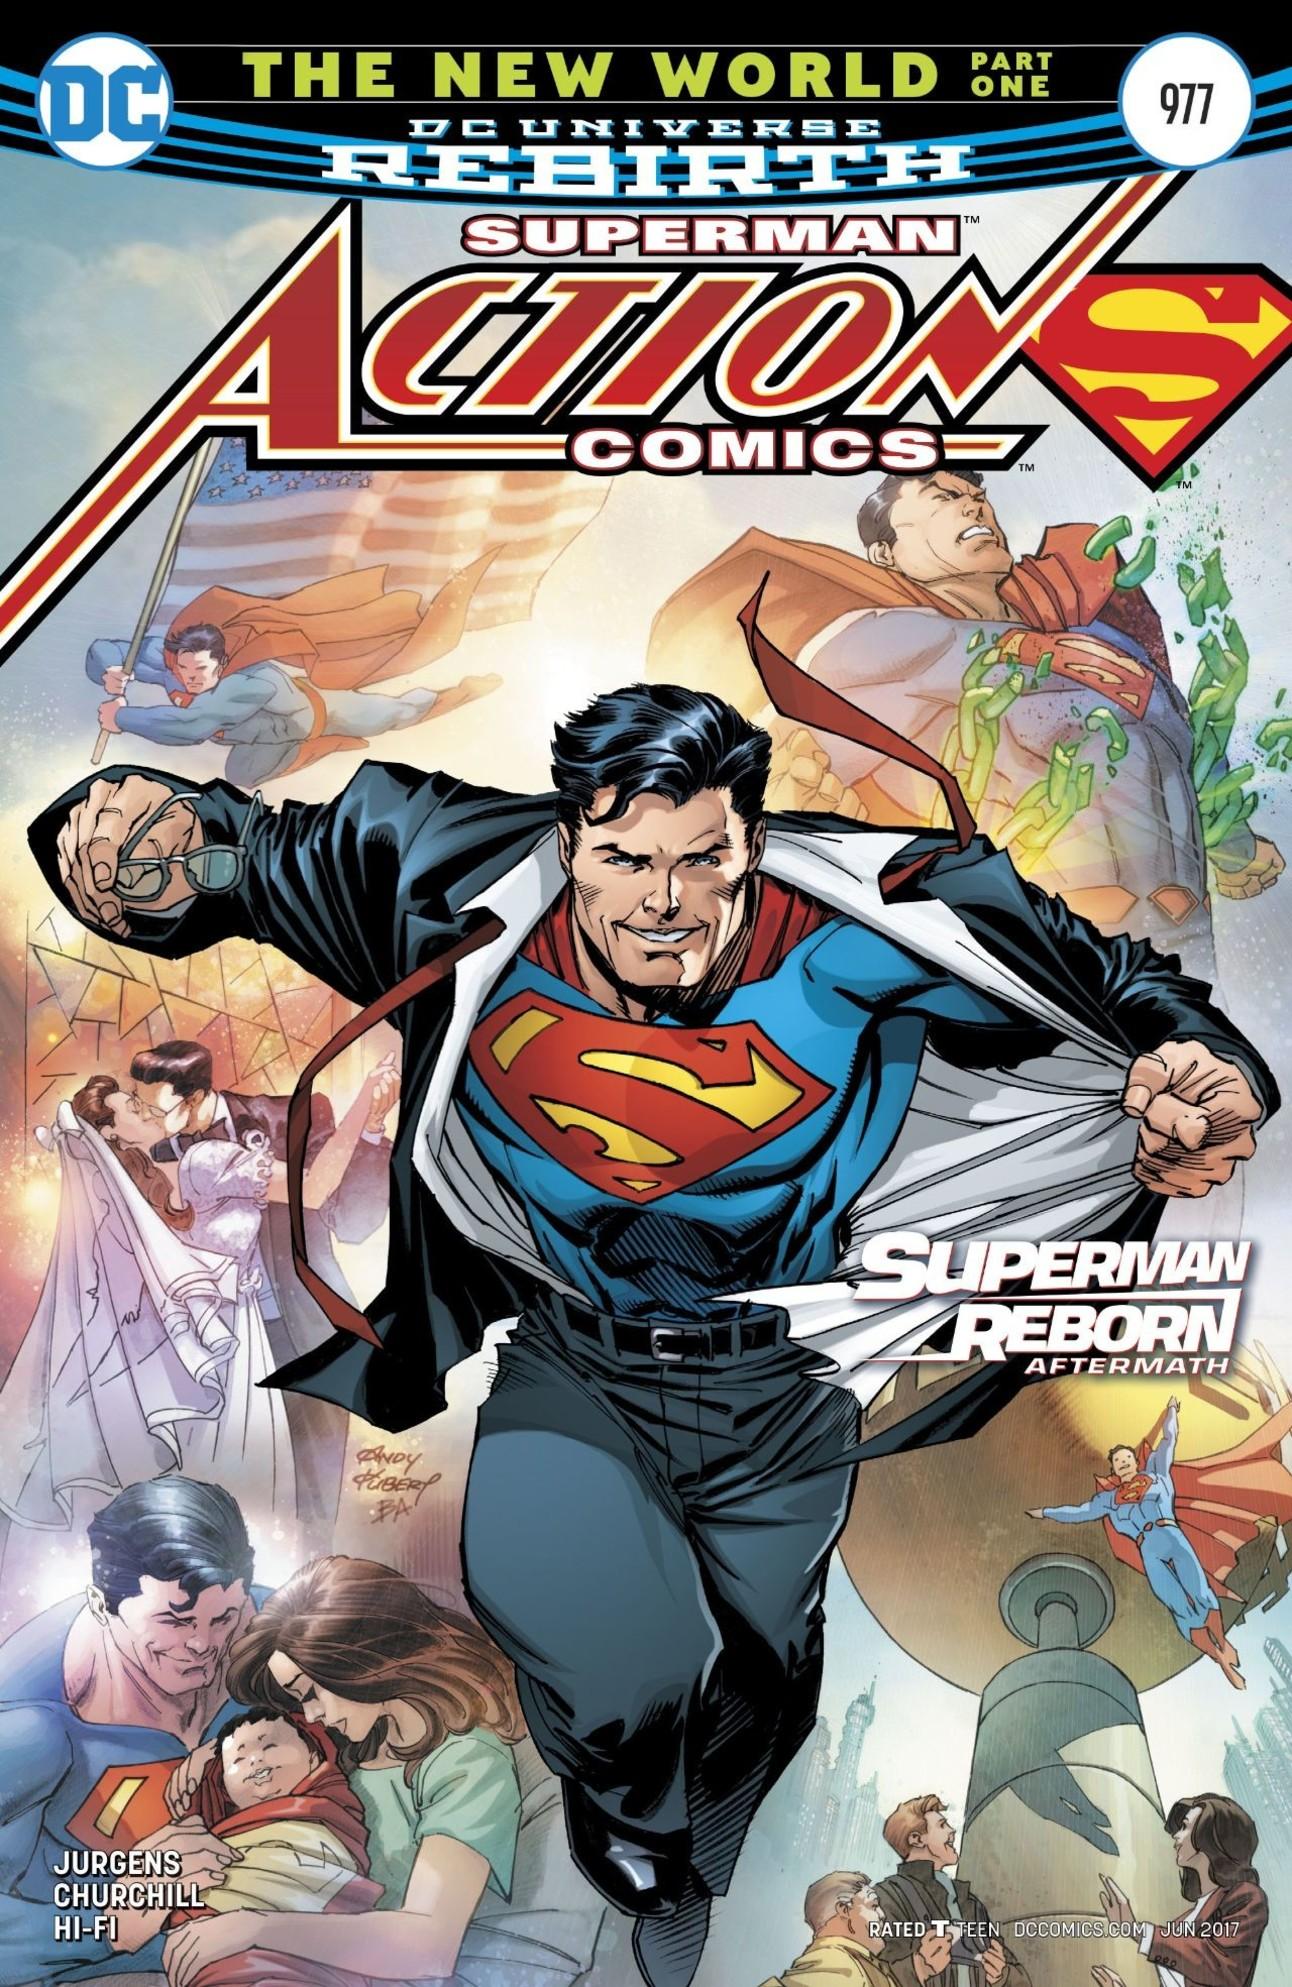 Superman Action Comics The New World